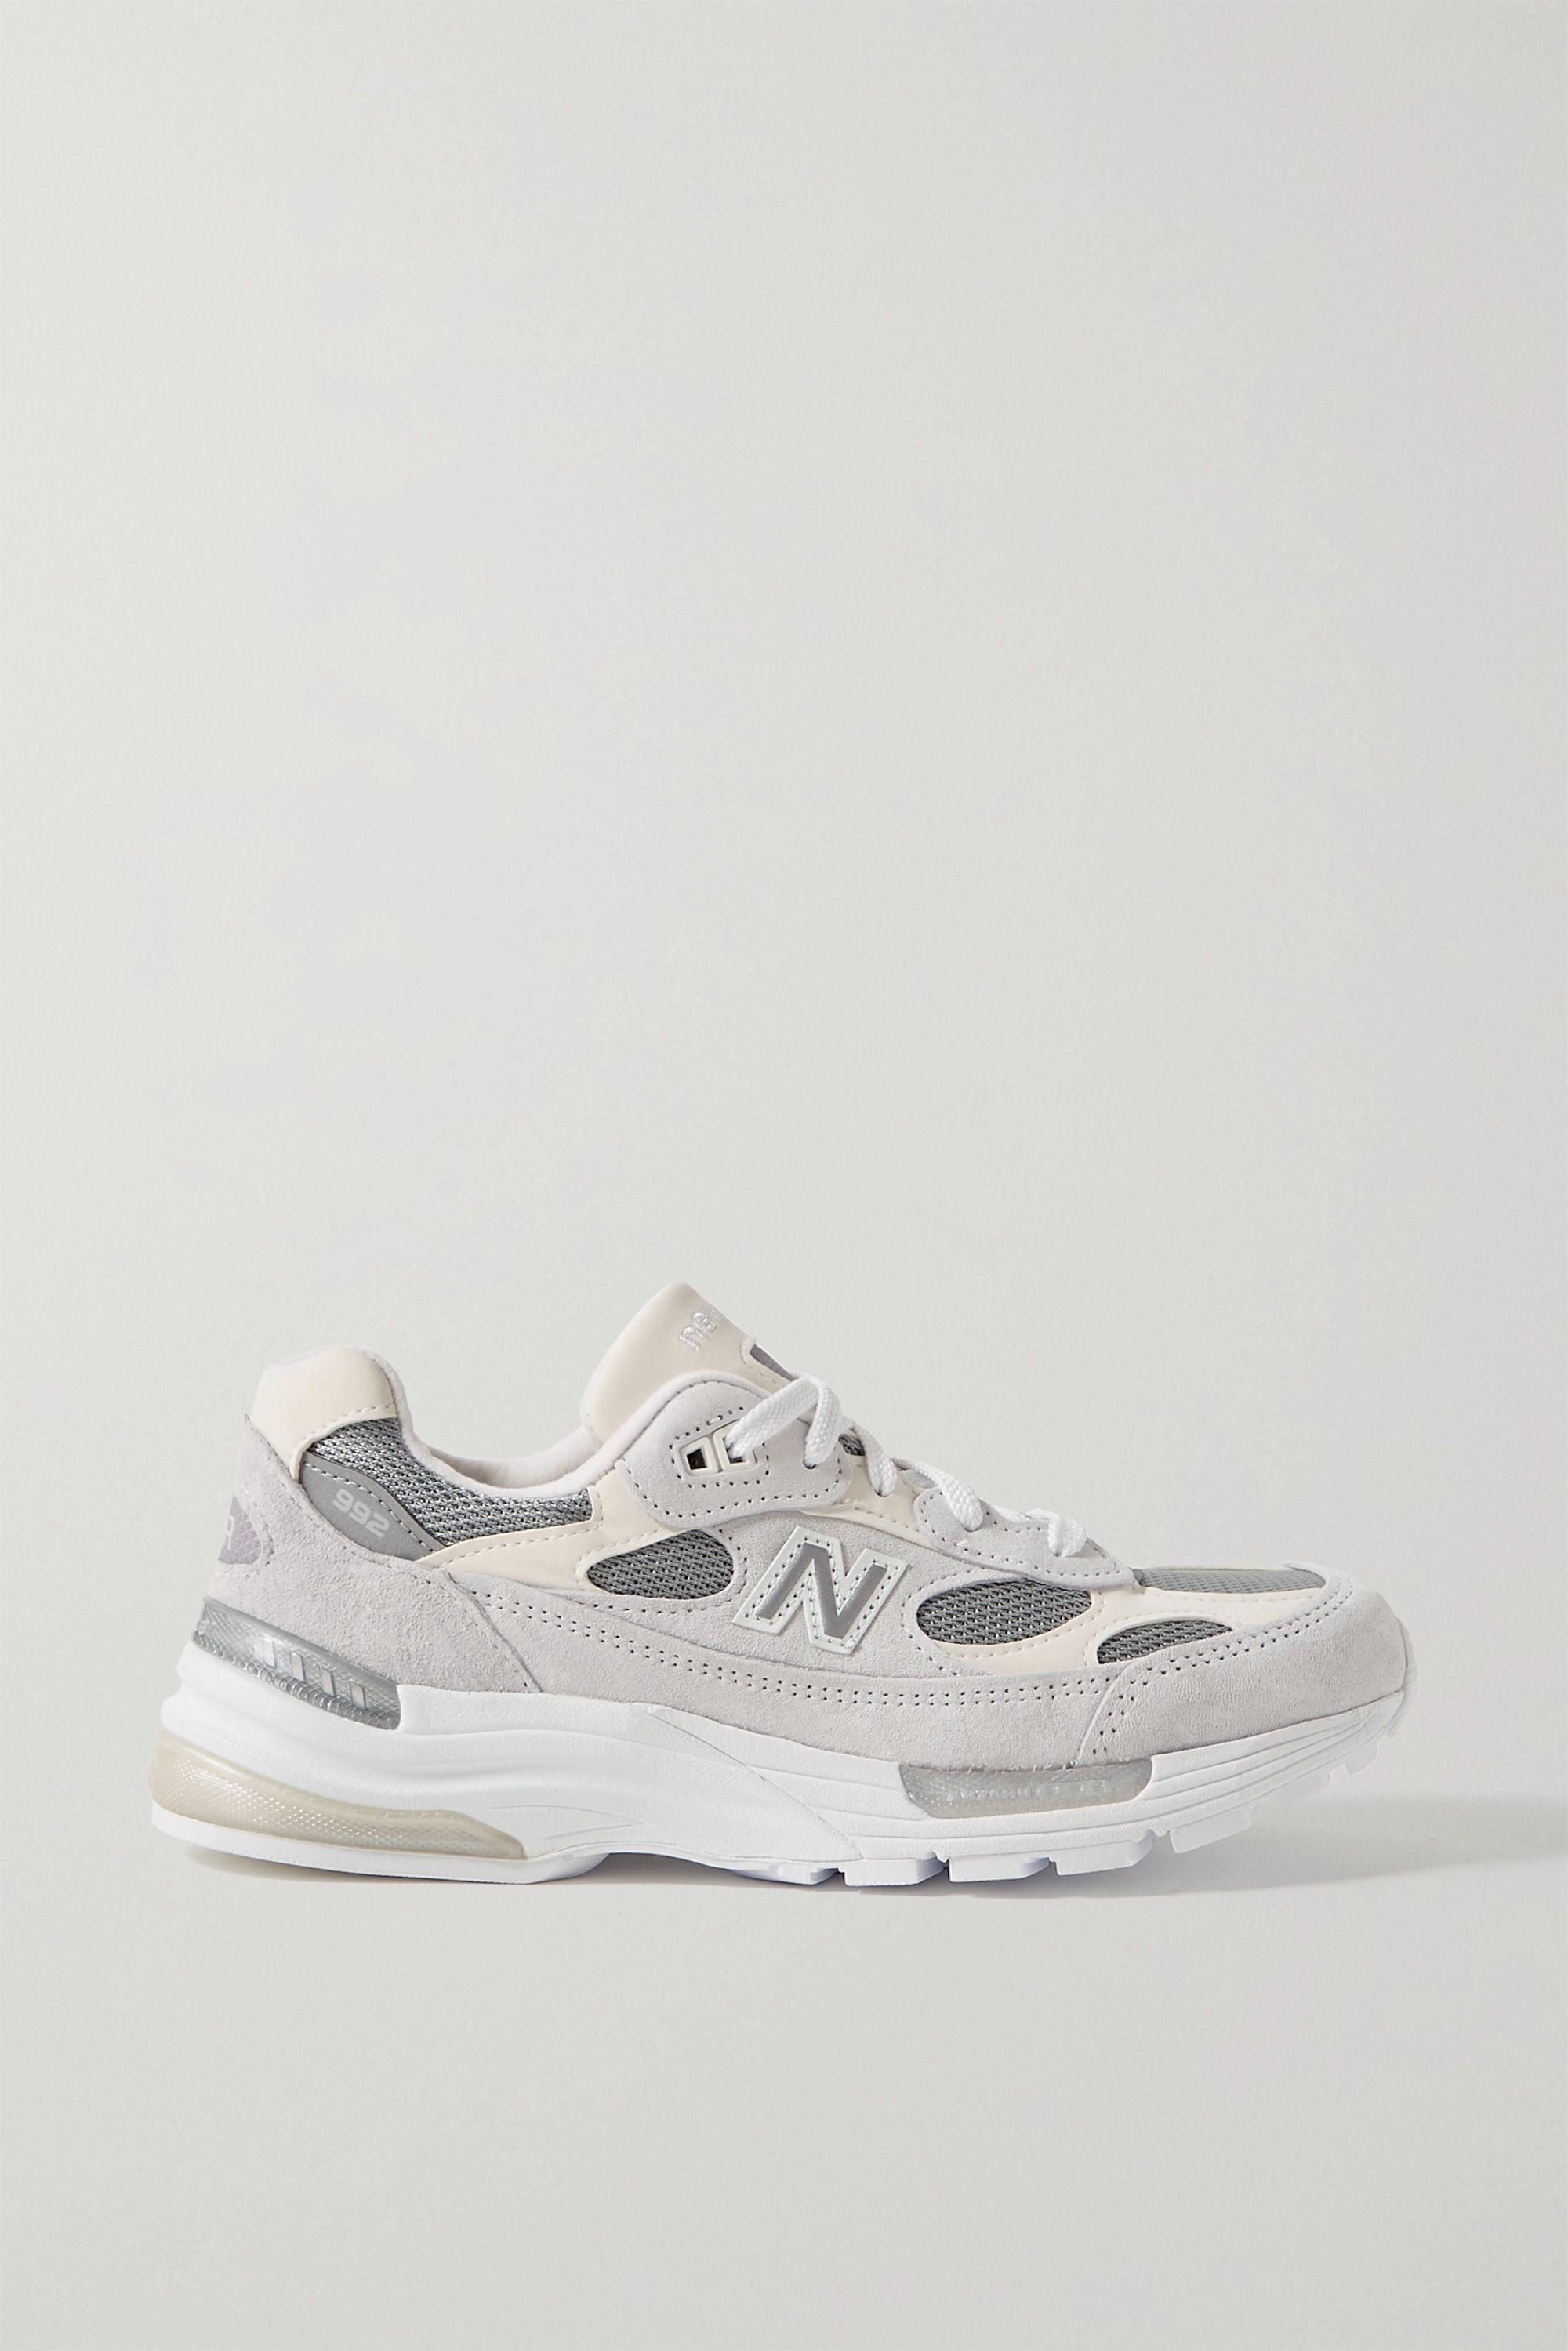 New Balance 992 绒面革网眼运动鞋